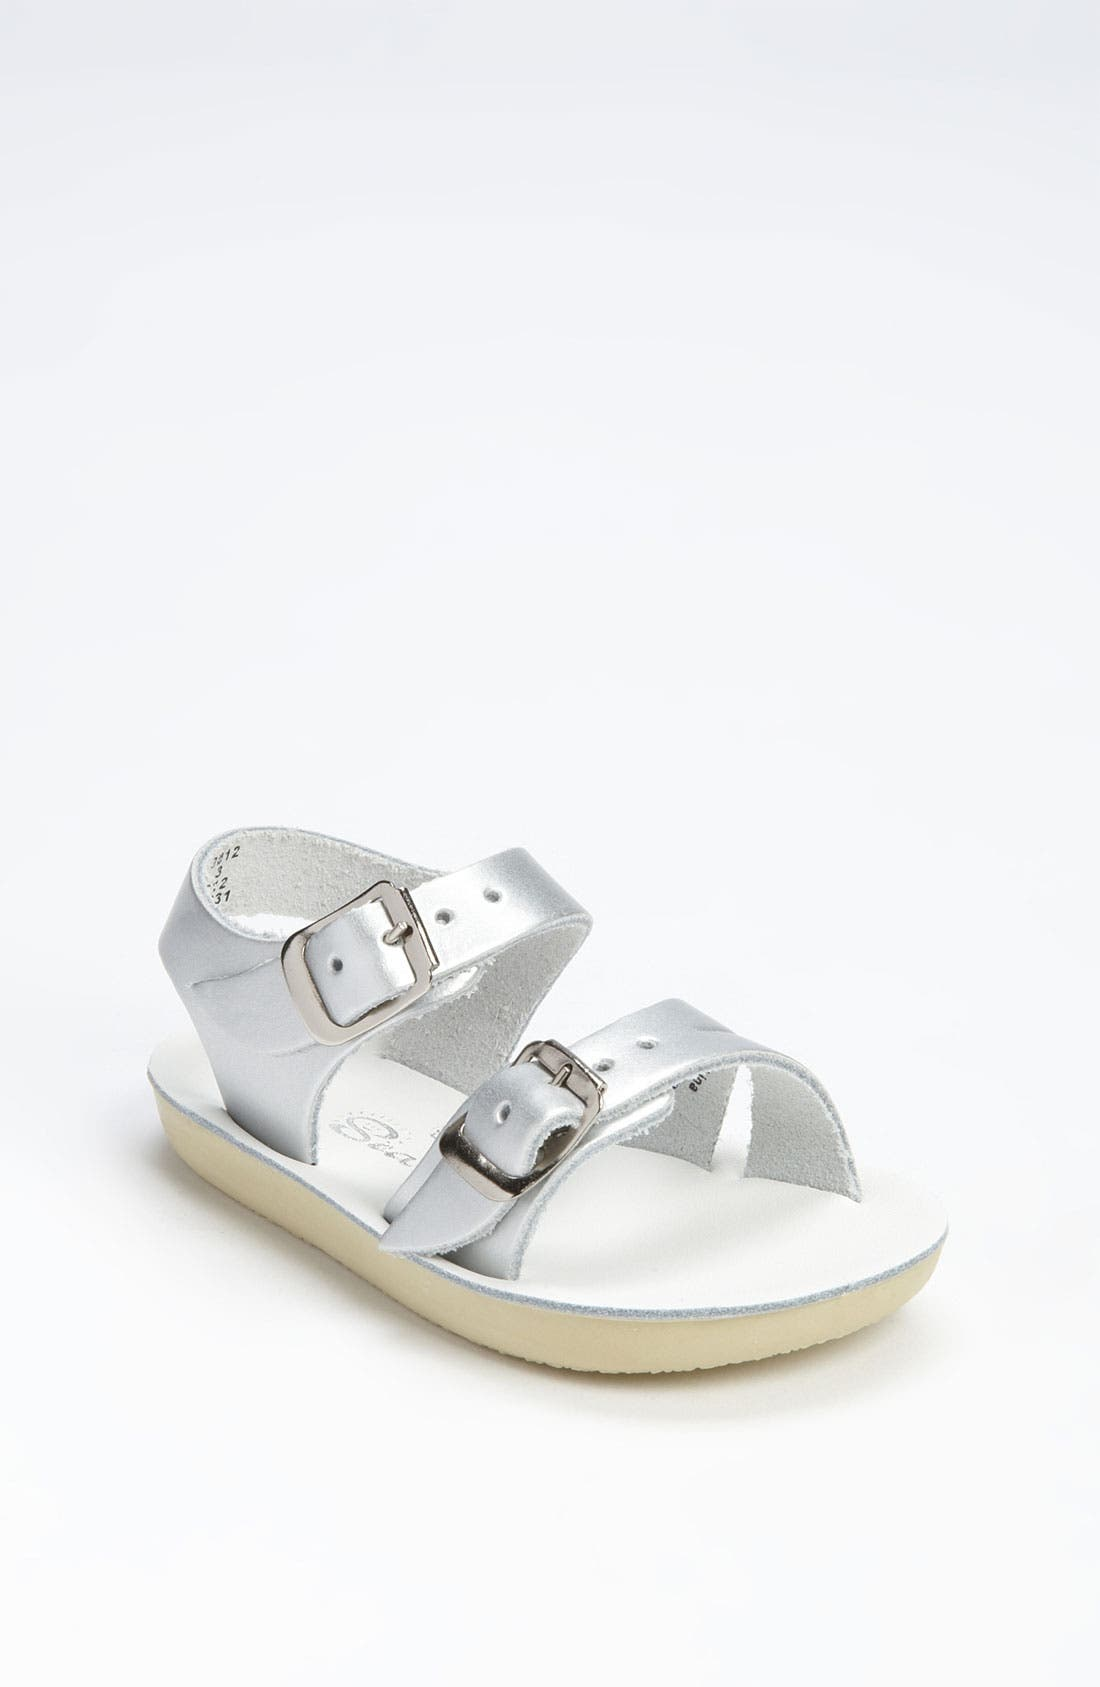 'Sea Wee' Sandal,                         Main,                         color,